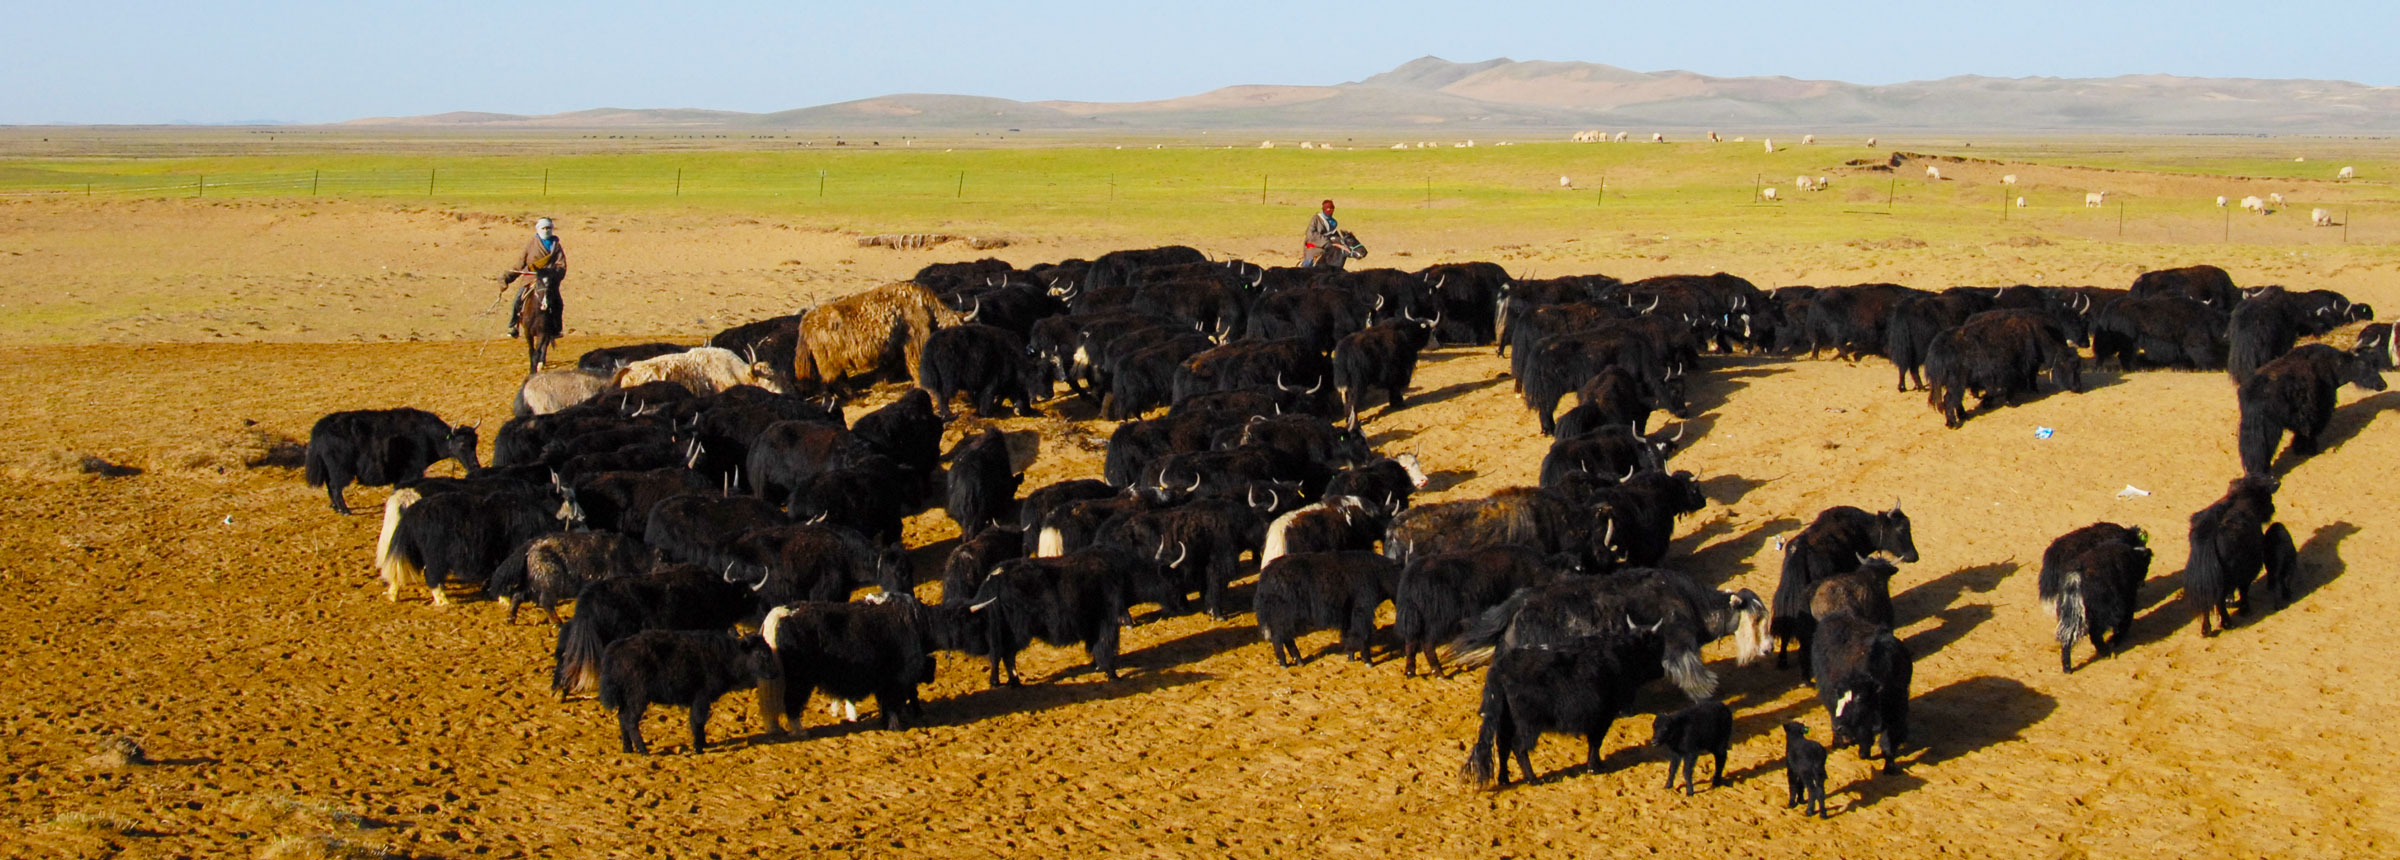 Tibetans herding yak